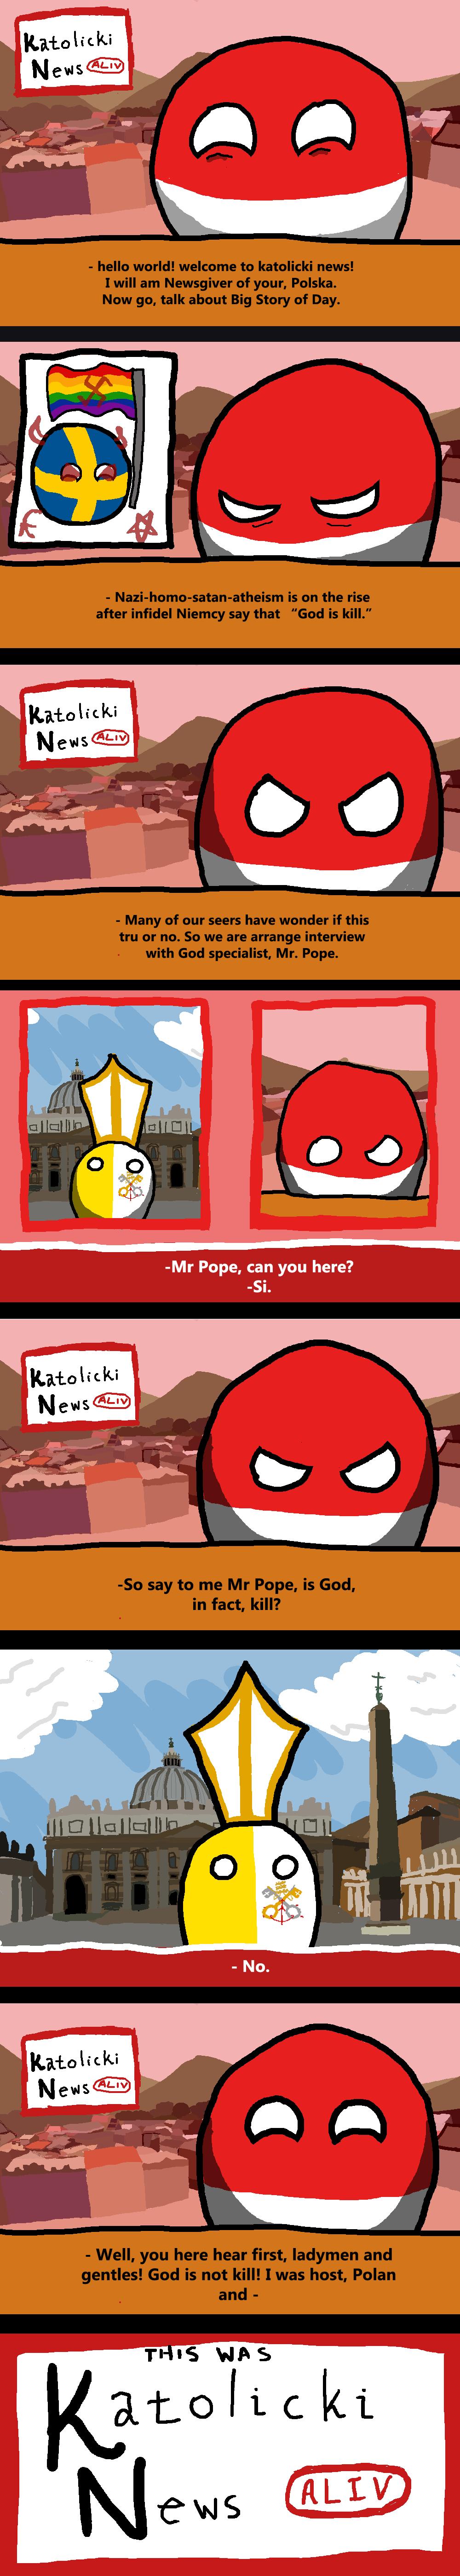 Katolicki News: Aliv